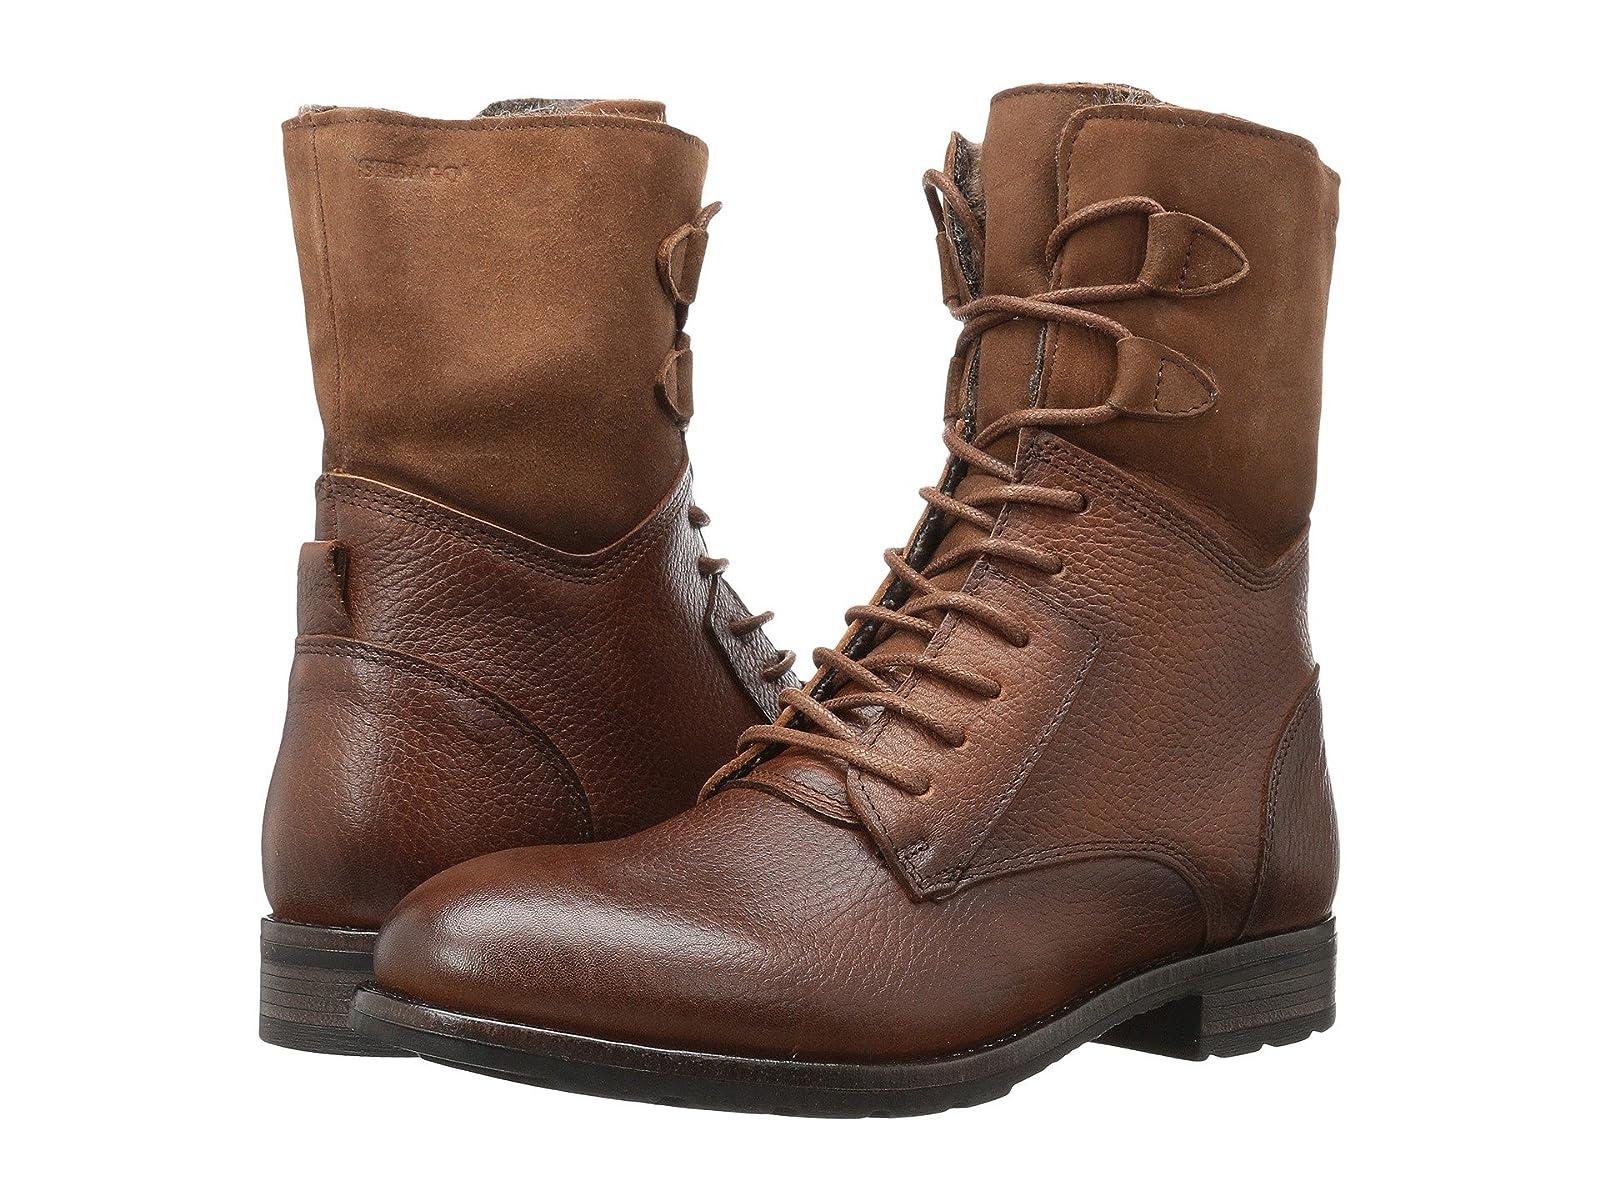 Sebago Laney Lace BootCheap and distinctive eye-catching shoes